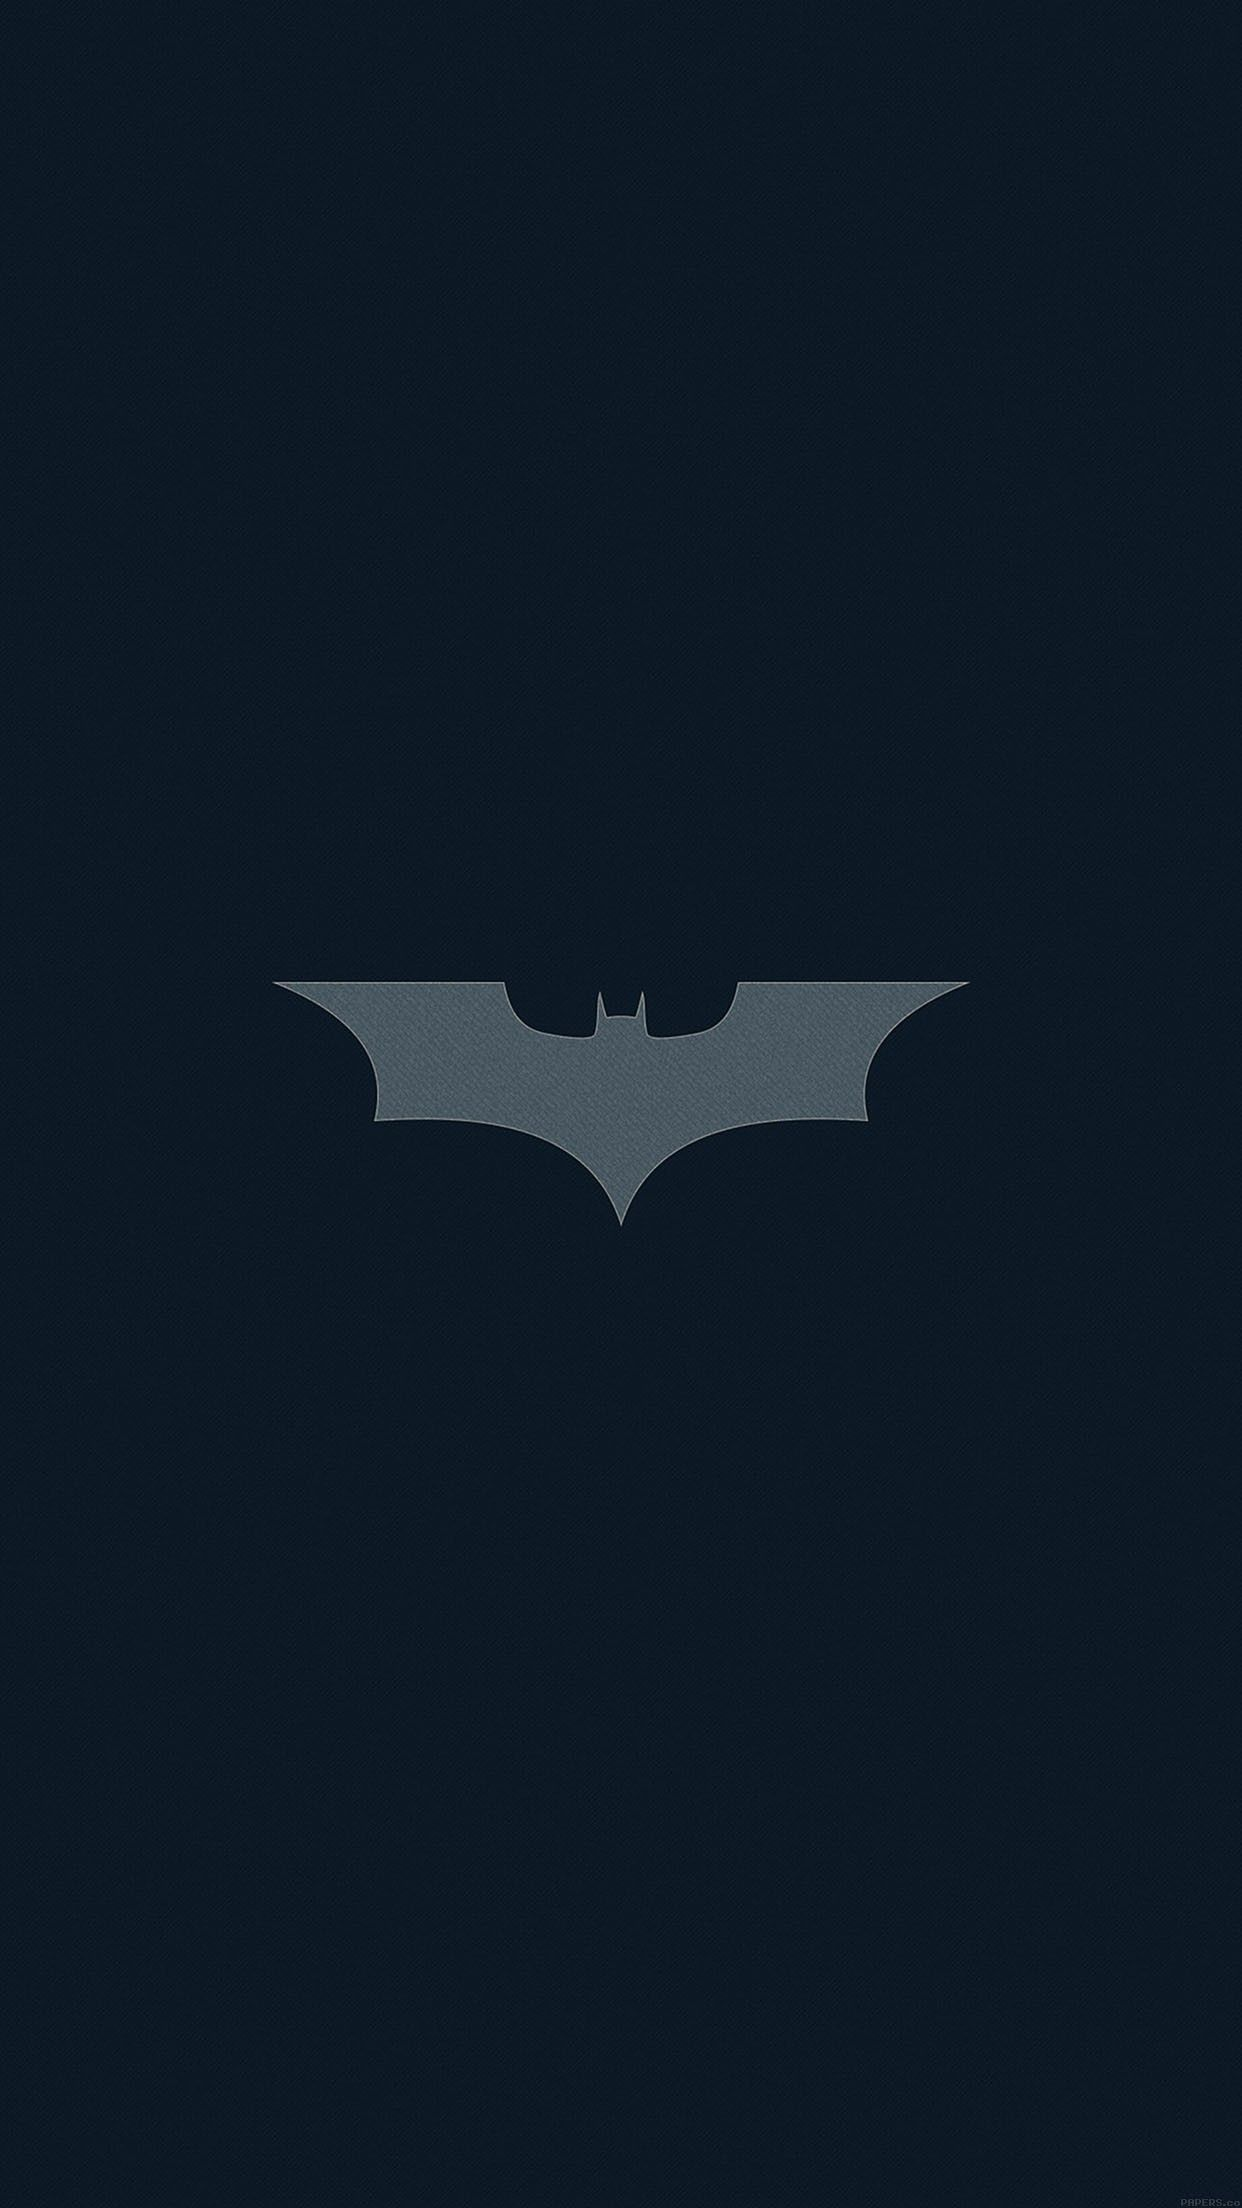 Pictures Batman Logo Iphone Wallpapers Batman Wallpaper Iphone Batman Wallpaper Iphone 7 Wallpapers